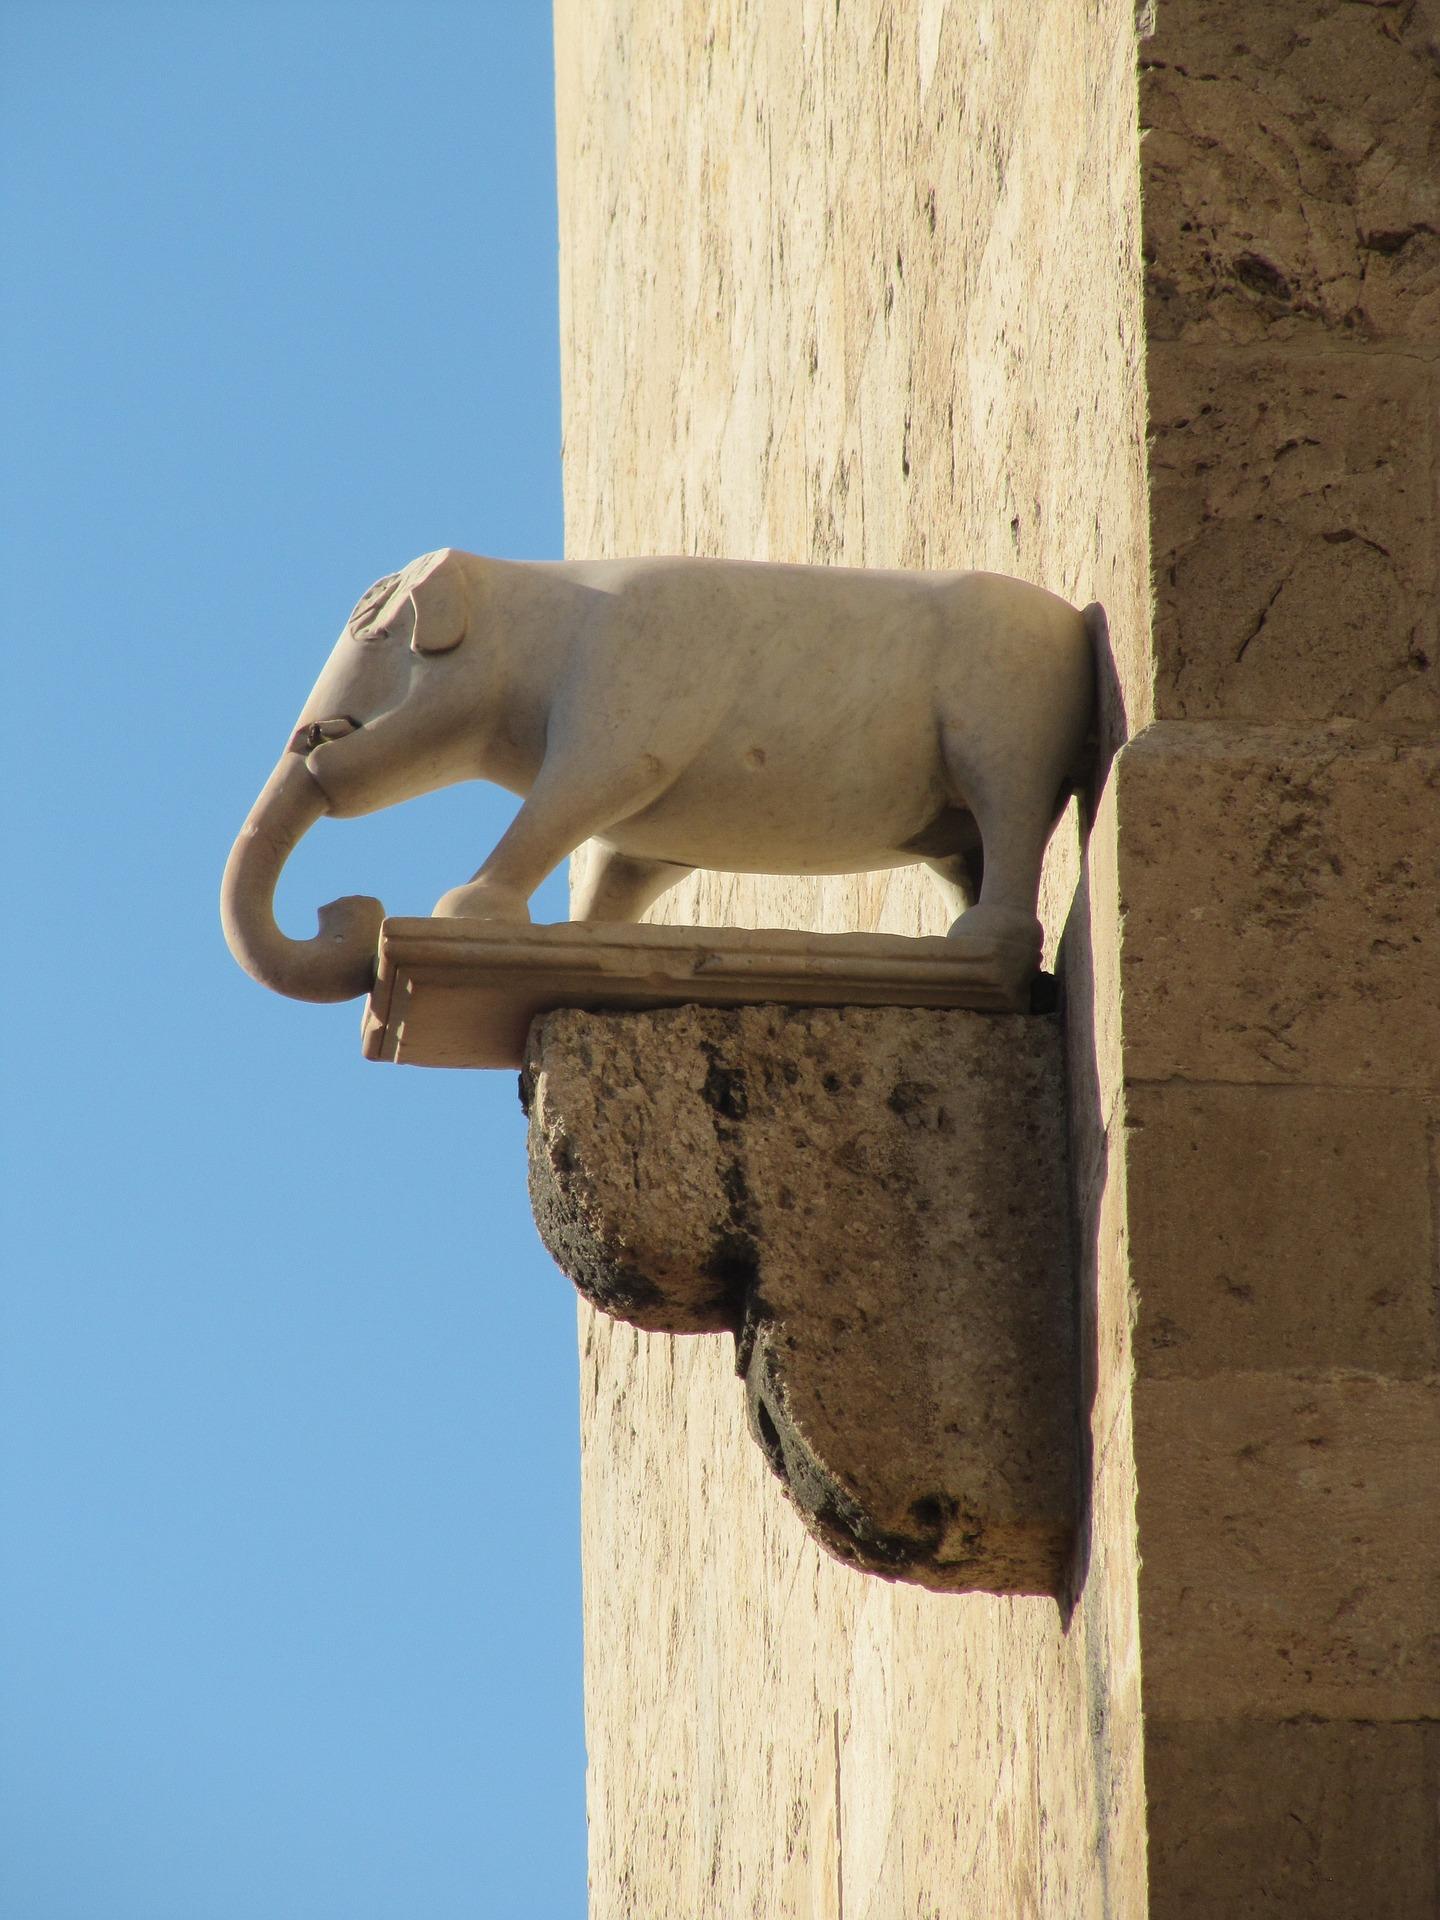 elephant-tower-526149_1920